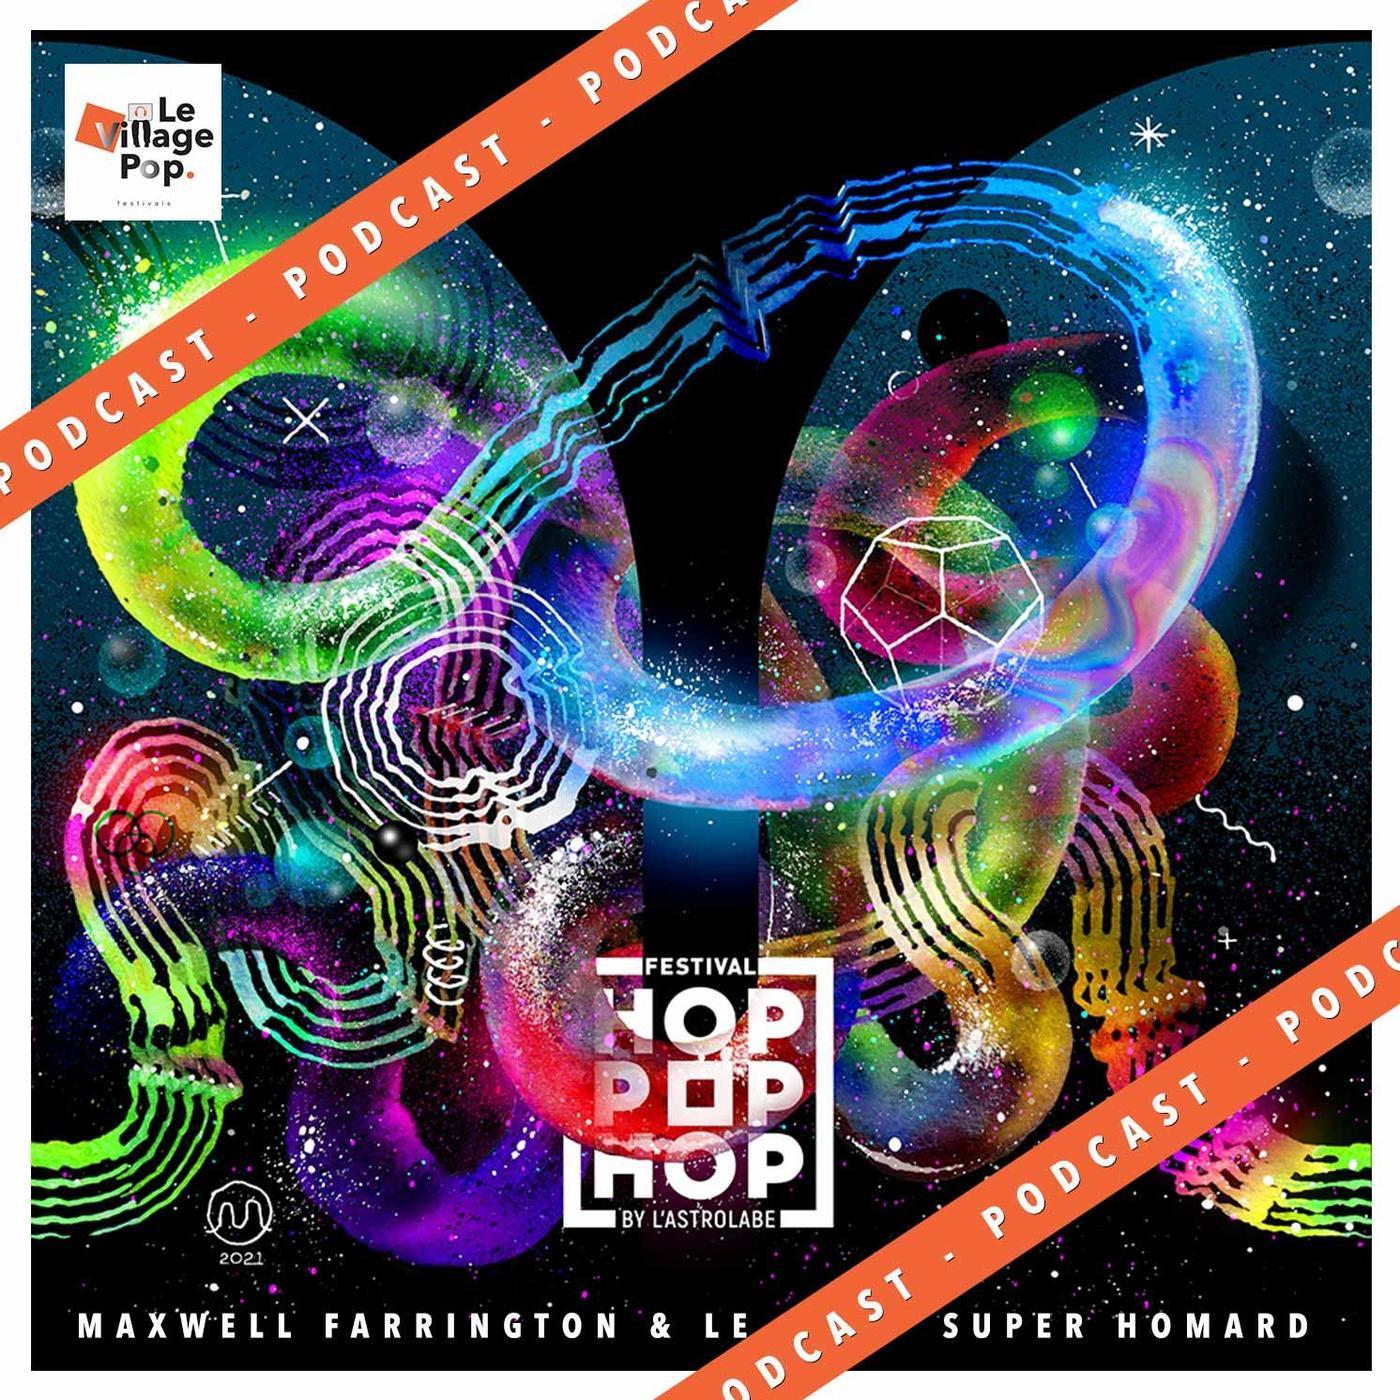 Festival HOP POP HOP 2021 - Maxwell Farrington & Le SuperHomard